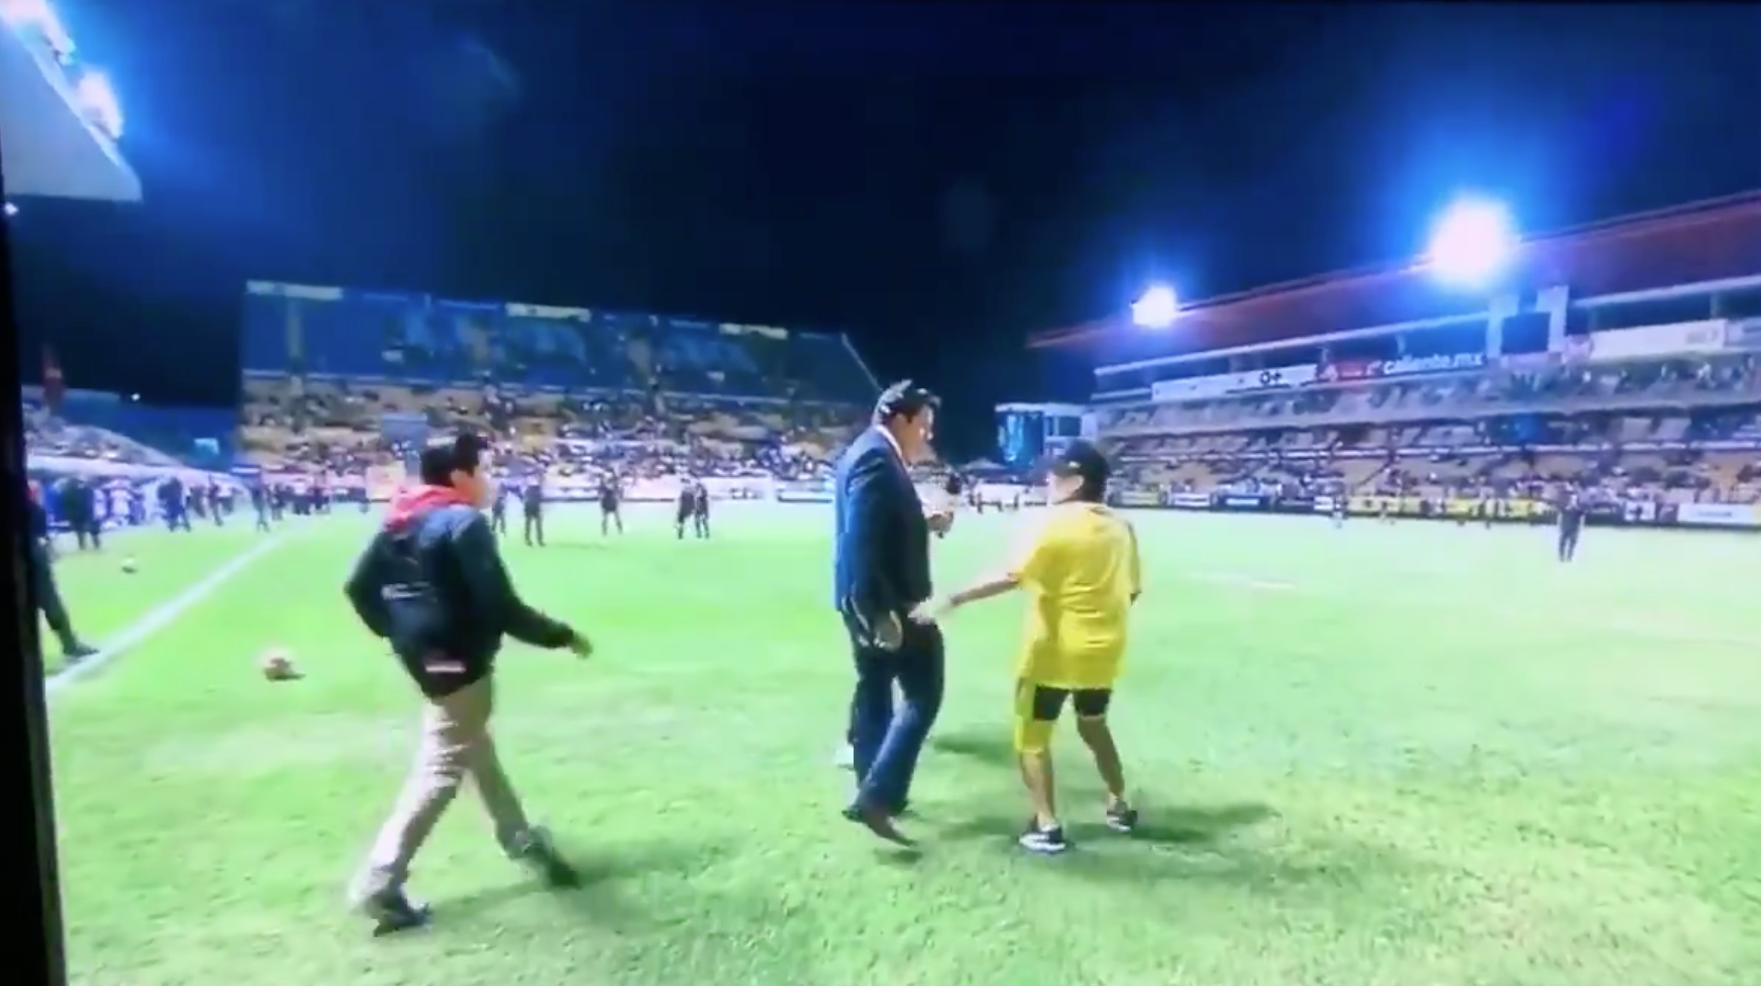 Diego Armando Maradona Seguridad Retiren Periodista